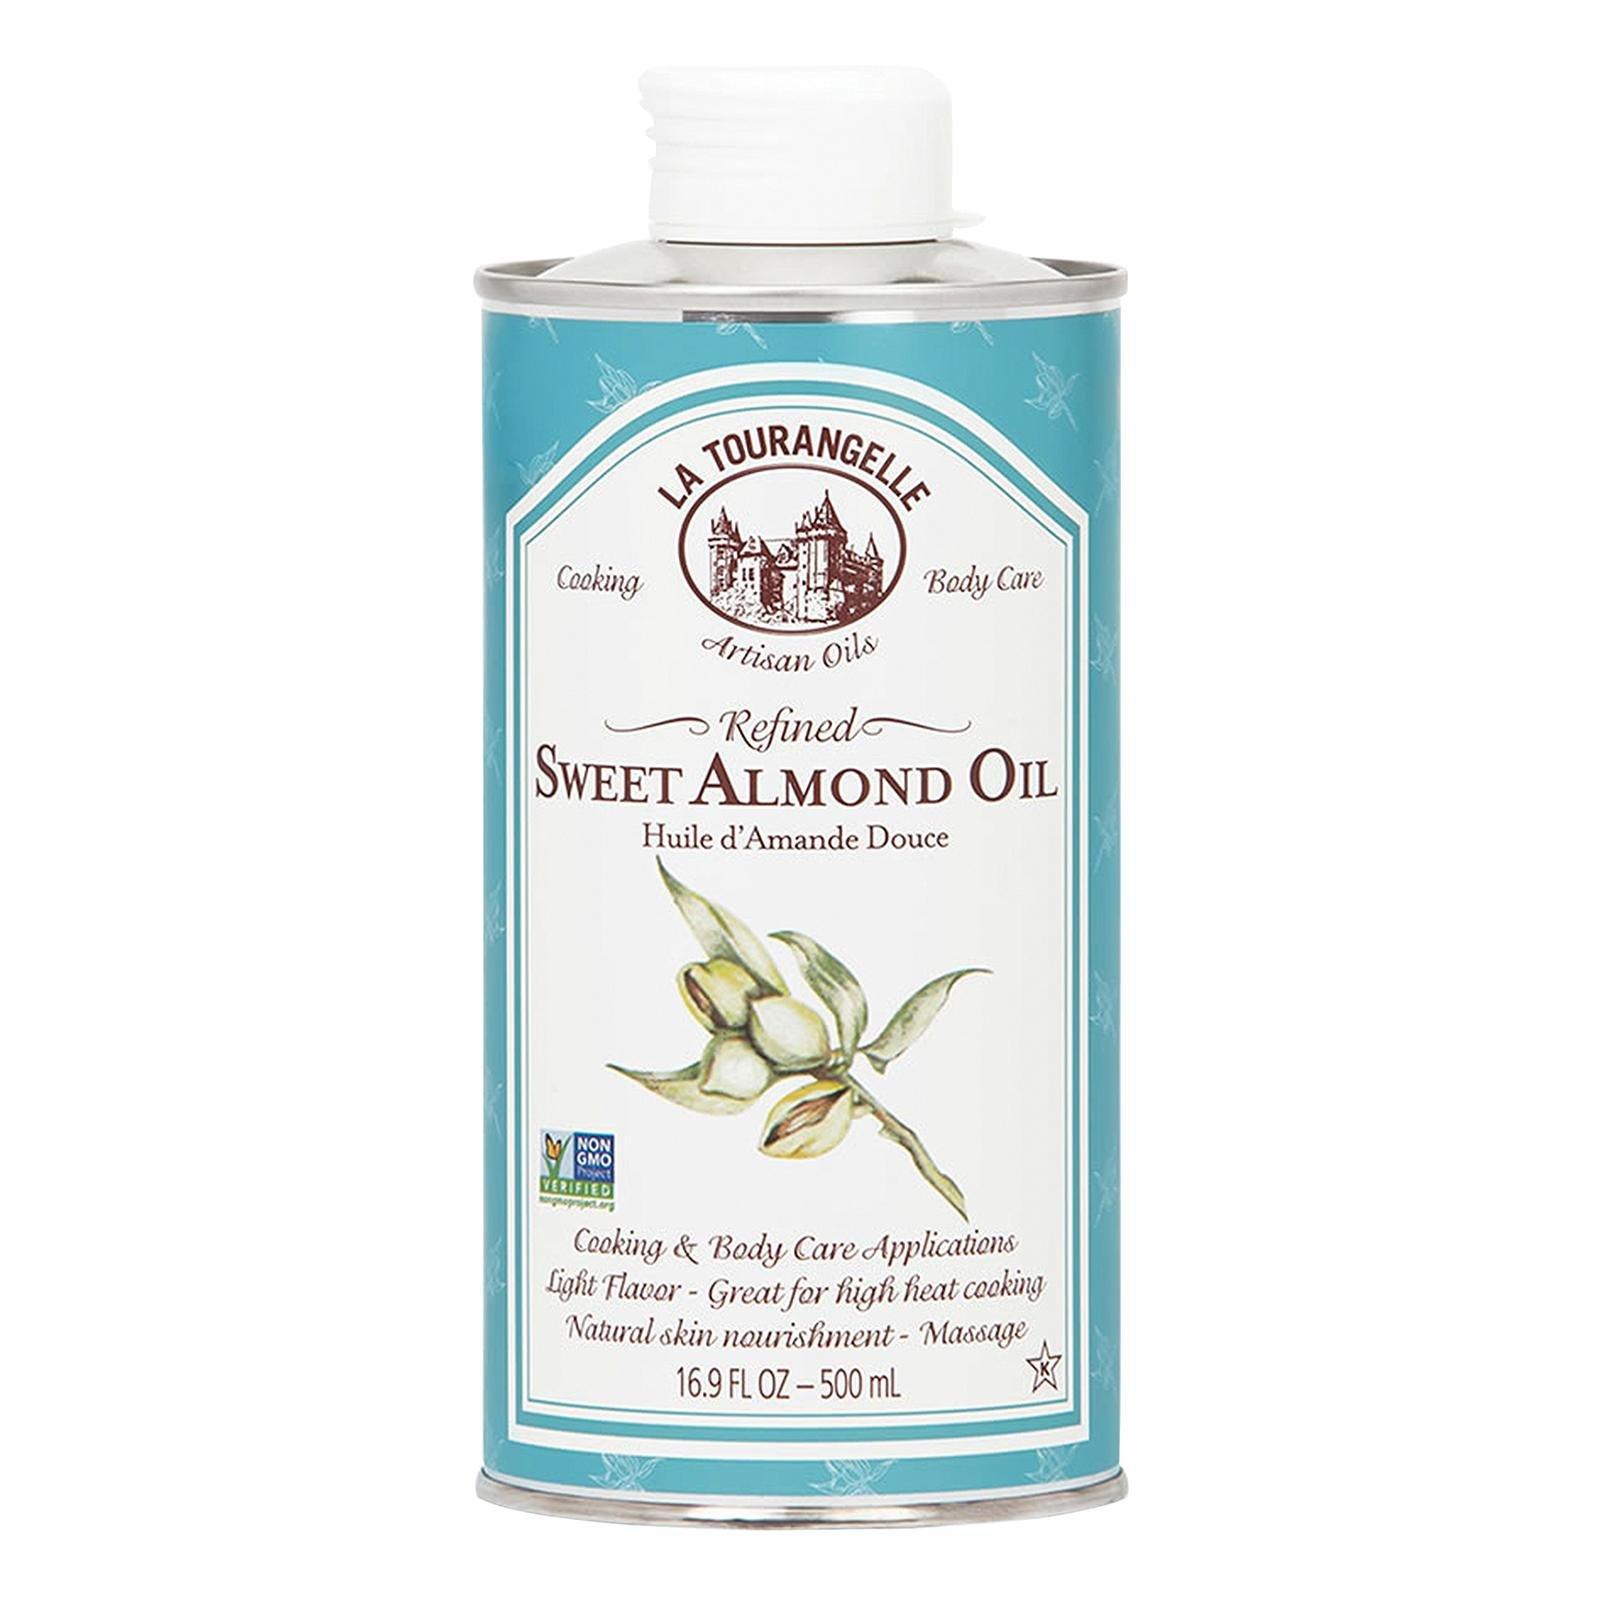 La Tourangelle, Sweet Almond Oil, Pack of 6, Size - 16.9 FZ, Quantity - 1 Case